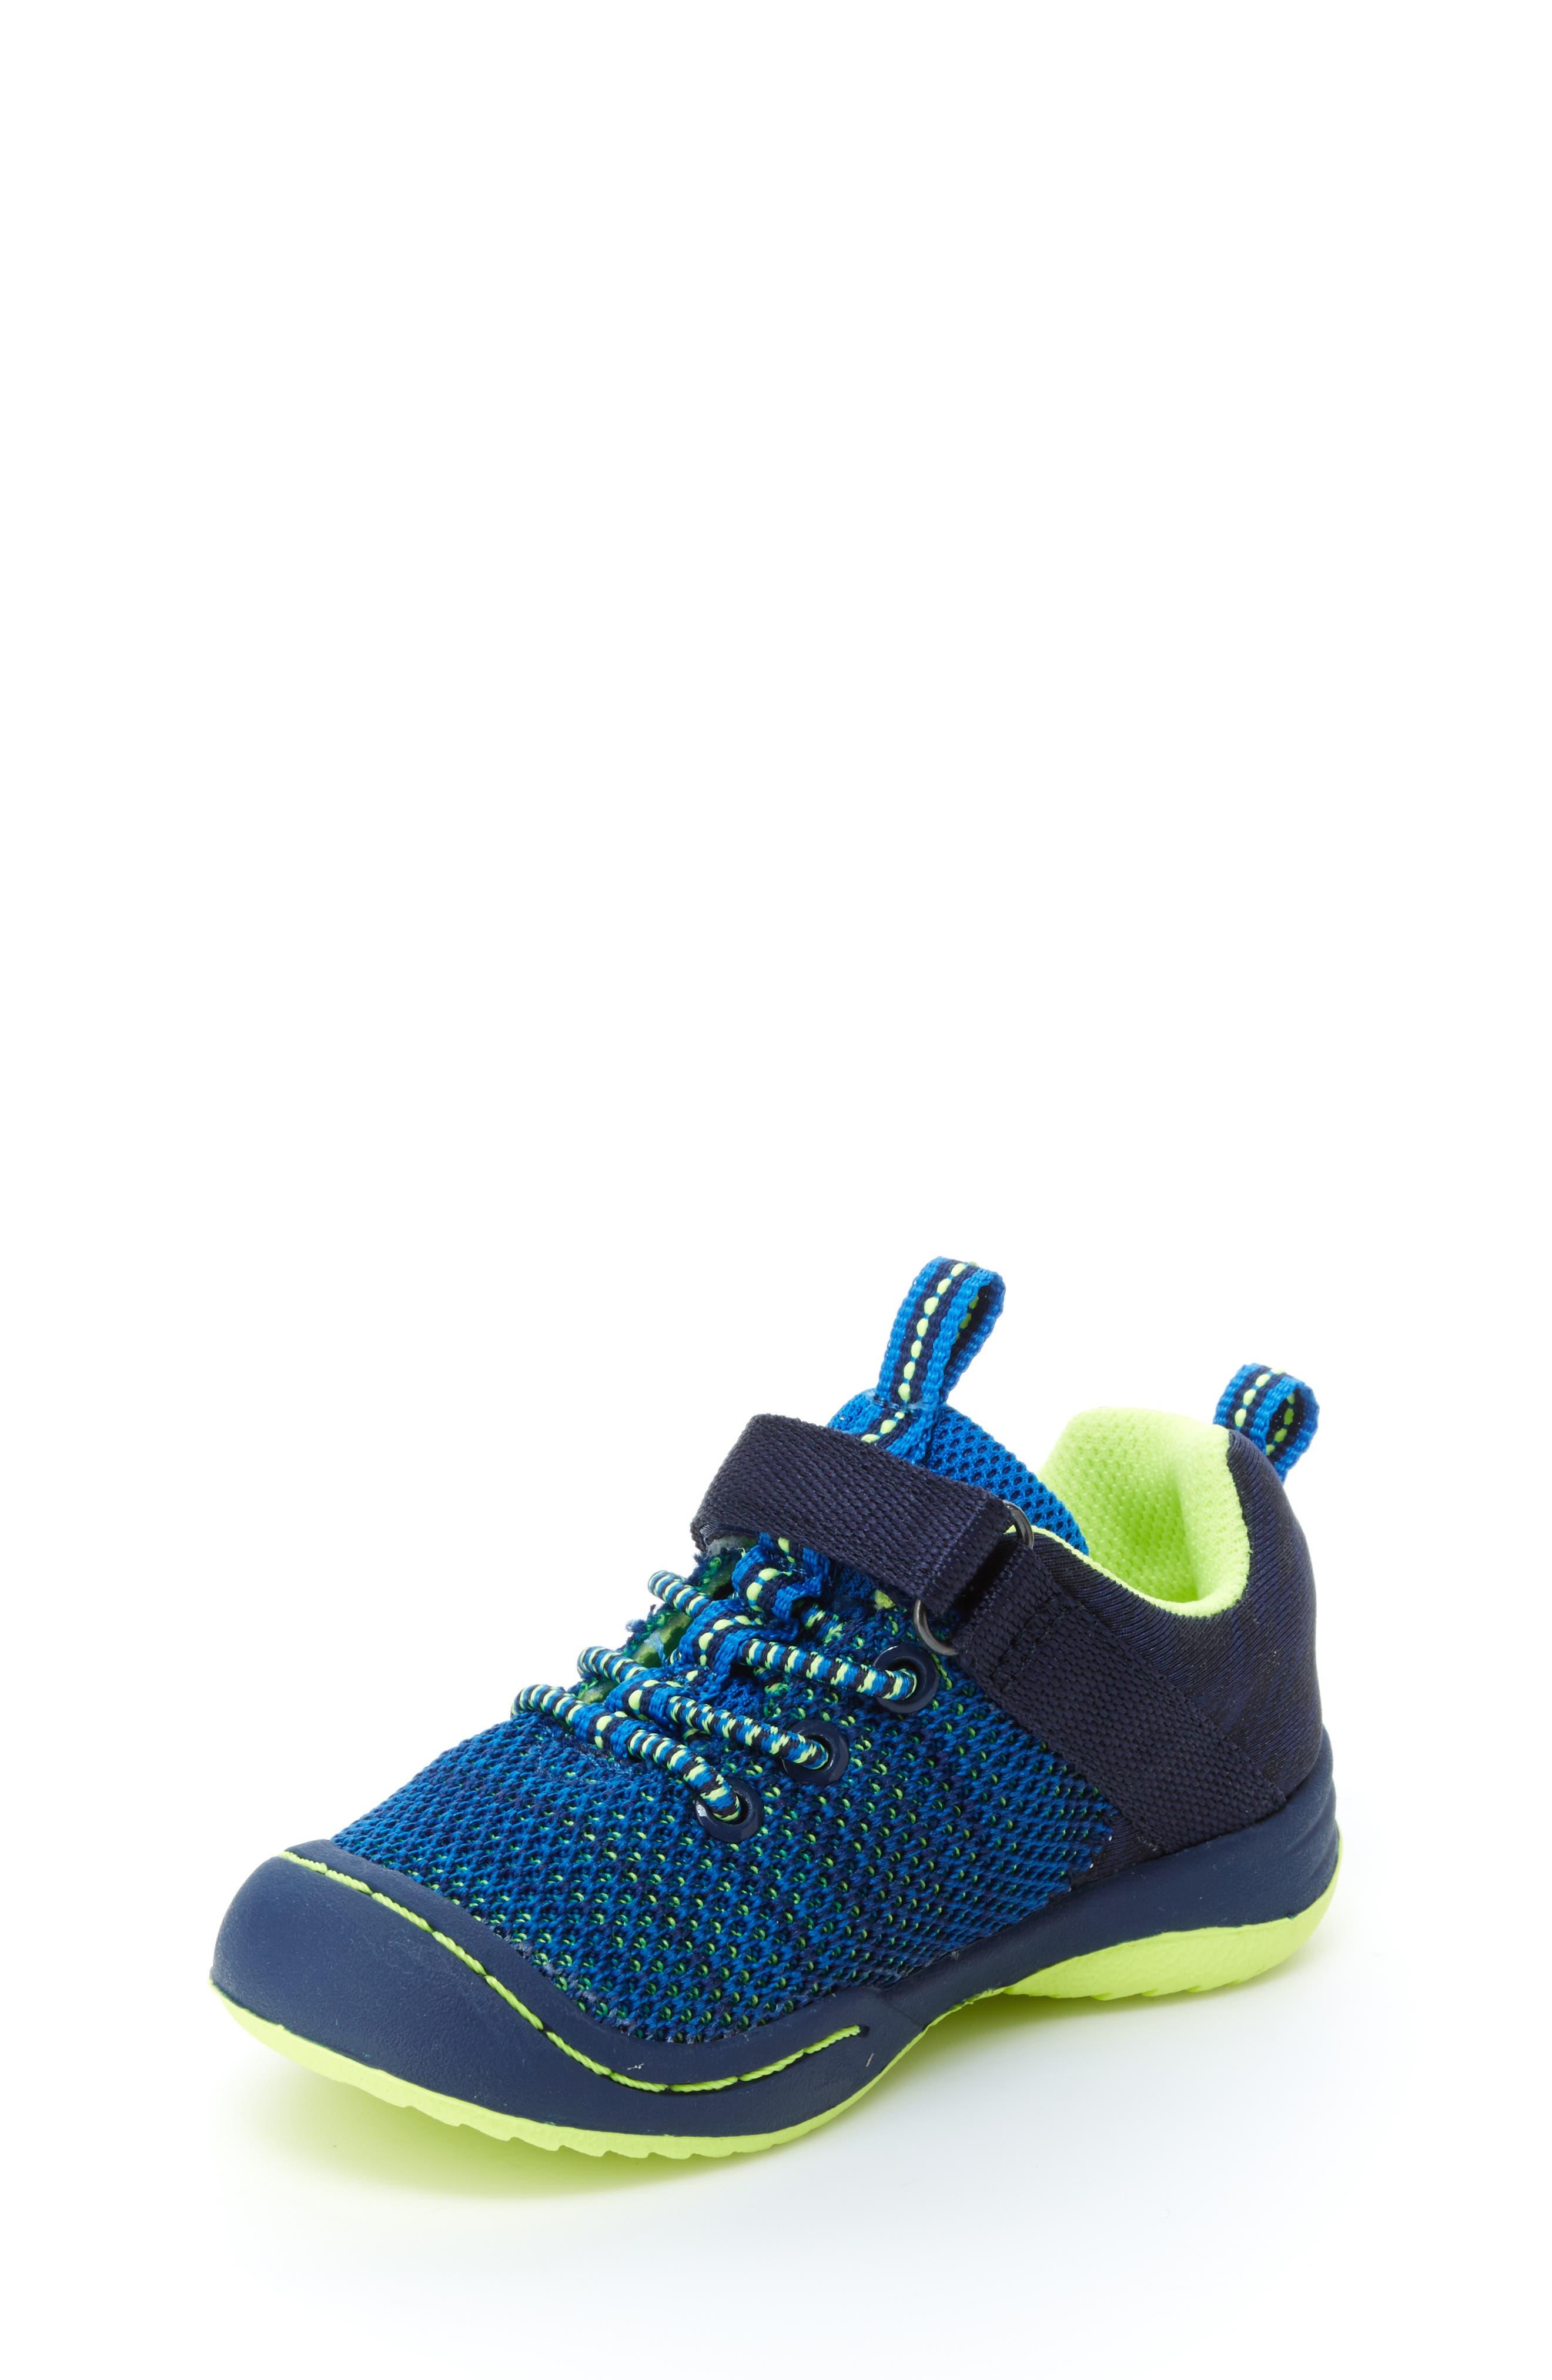 Talon Knit Sneaker,                             Alternate thumbnail 8, color,                             NAVY TEXTILE